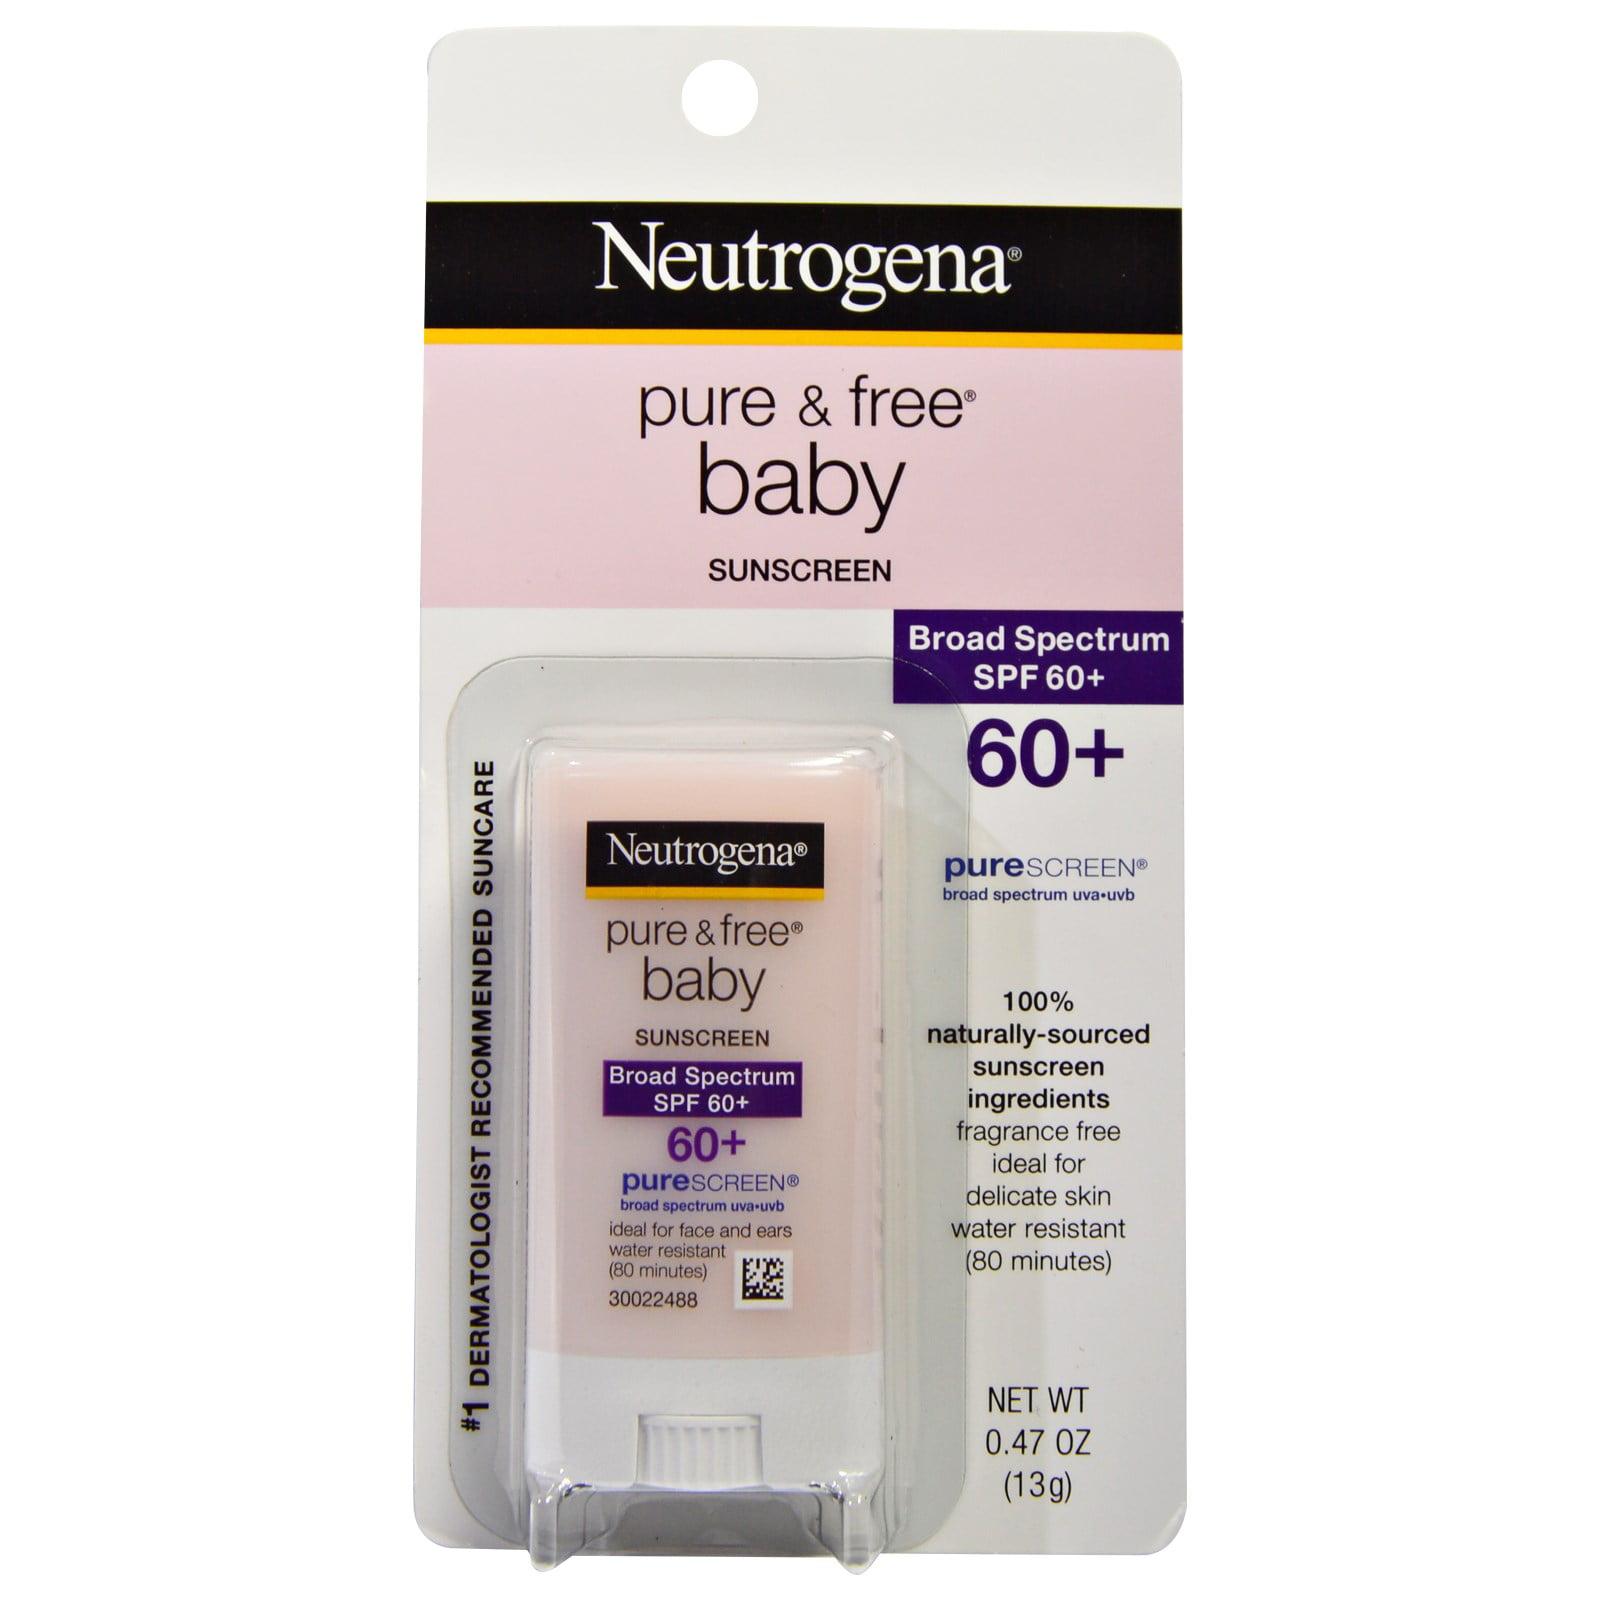 Neutrogena, Pure & Free Baby Sunscreen, SPF 60+, 0.47 oz (pack of 1)